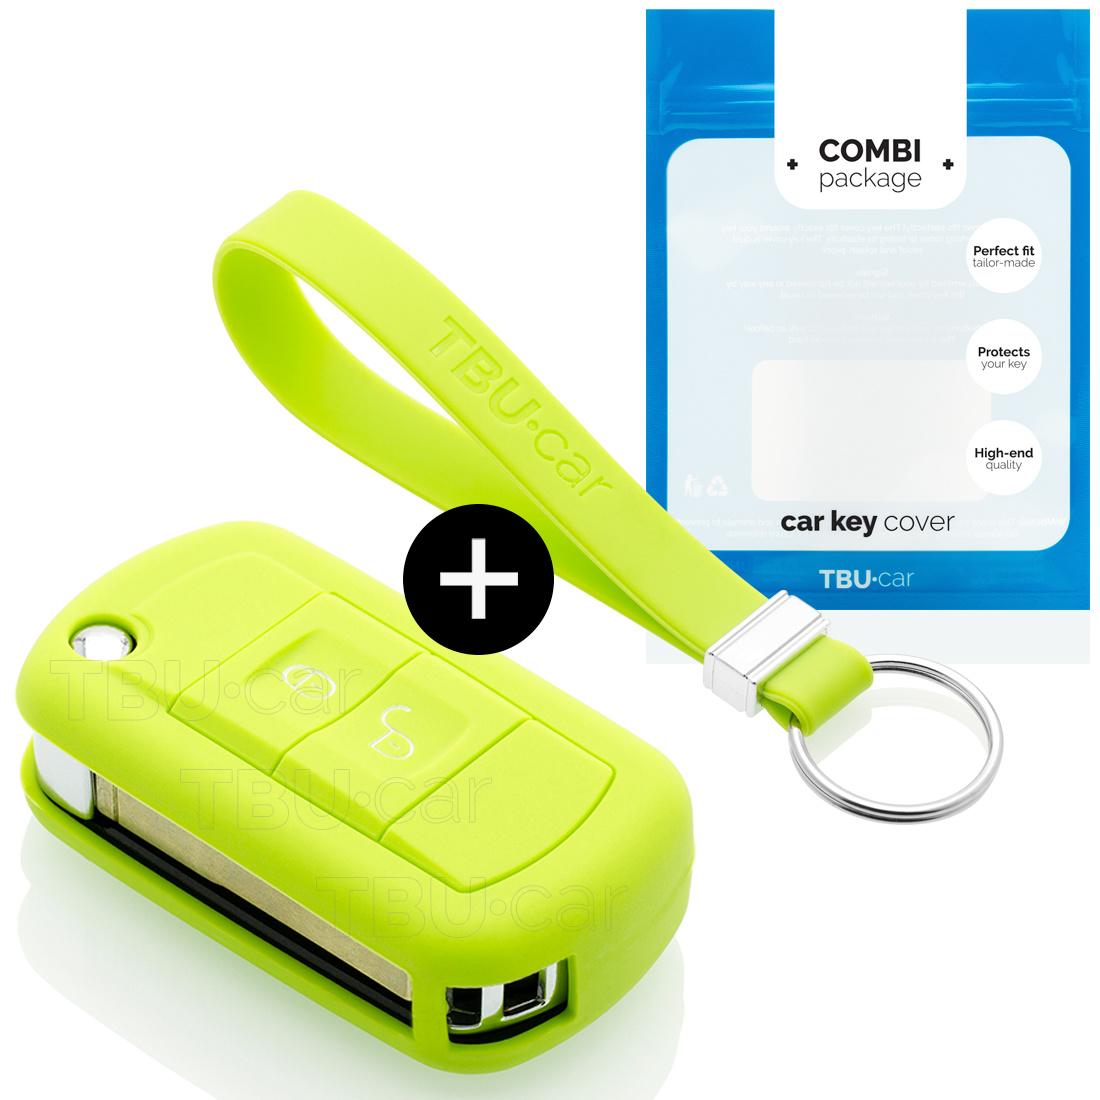 TBU car TBU car Sleutel cover compatibel met Land Rover - Silicone sleutelhoesje - beschermhoesje autosleutel - Lime groen